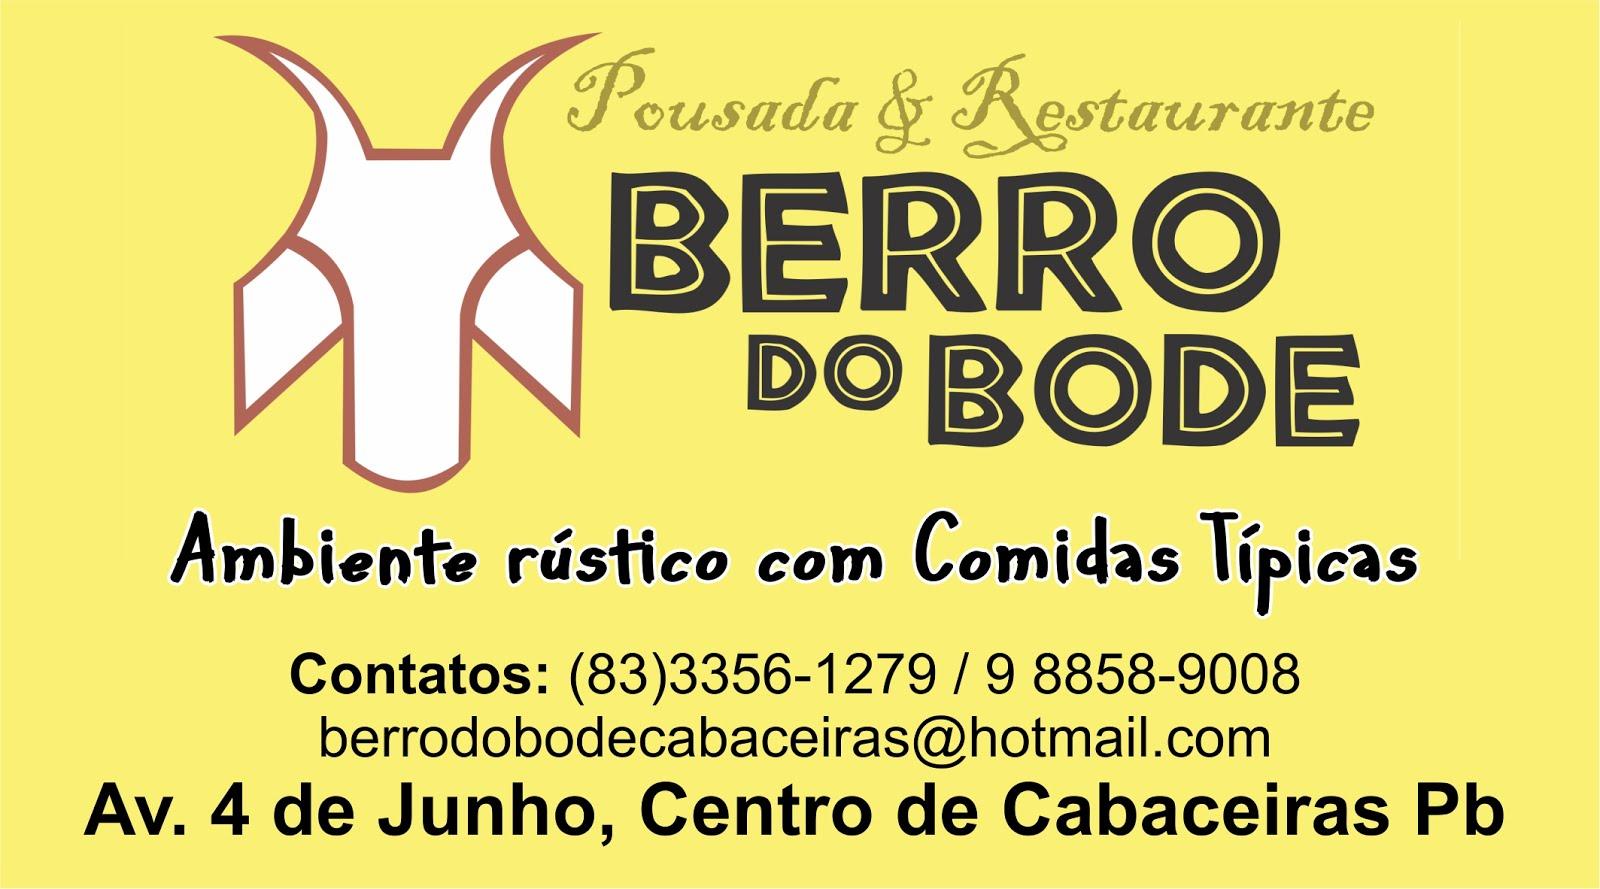 BERRO DO BODE